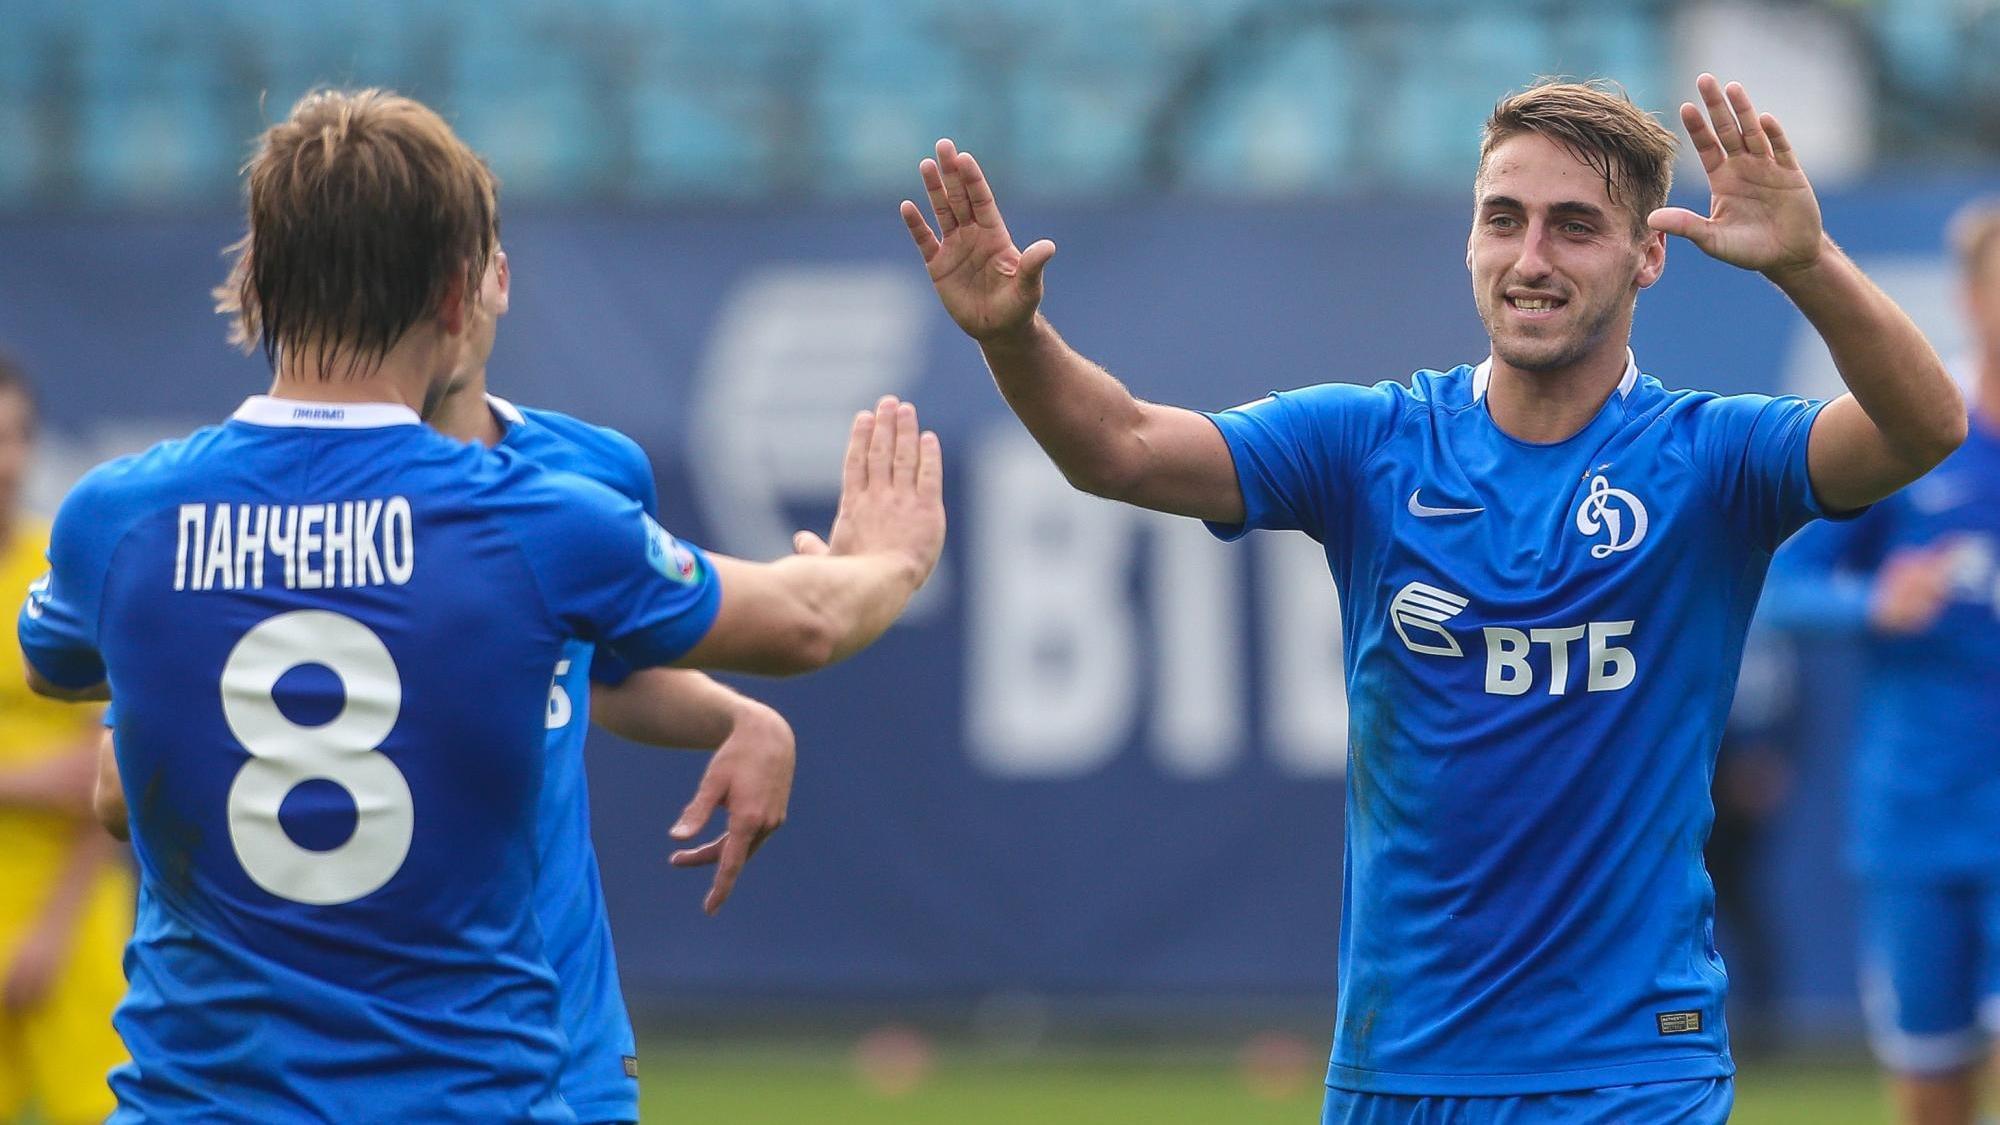 ВТБ реализовал акцииФК «Динамо-Москва» за1 руб.